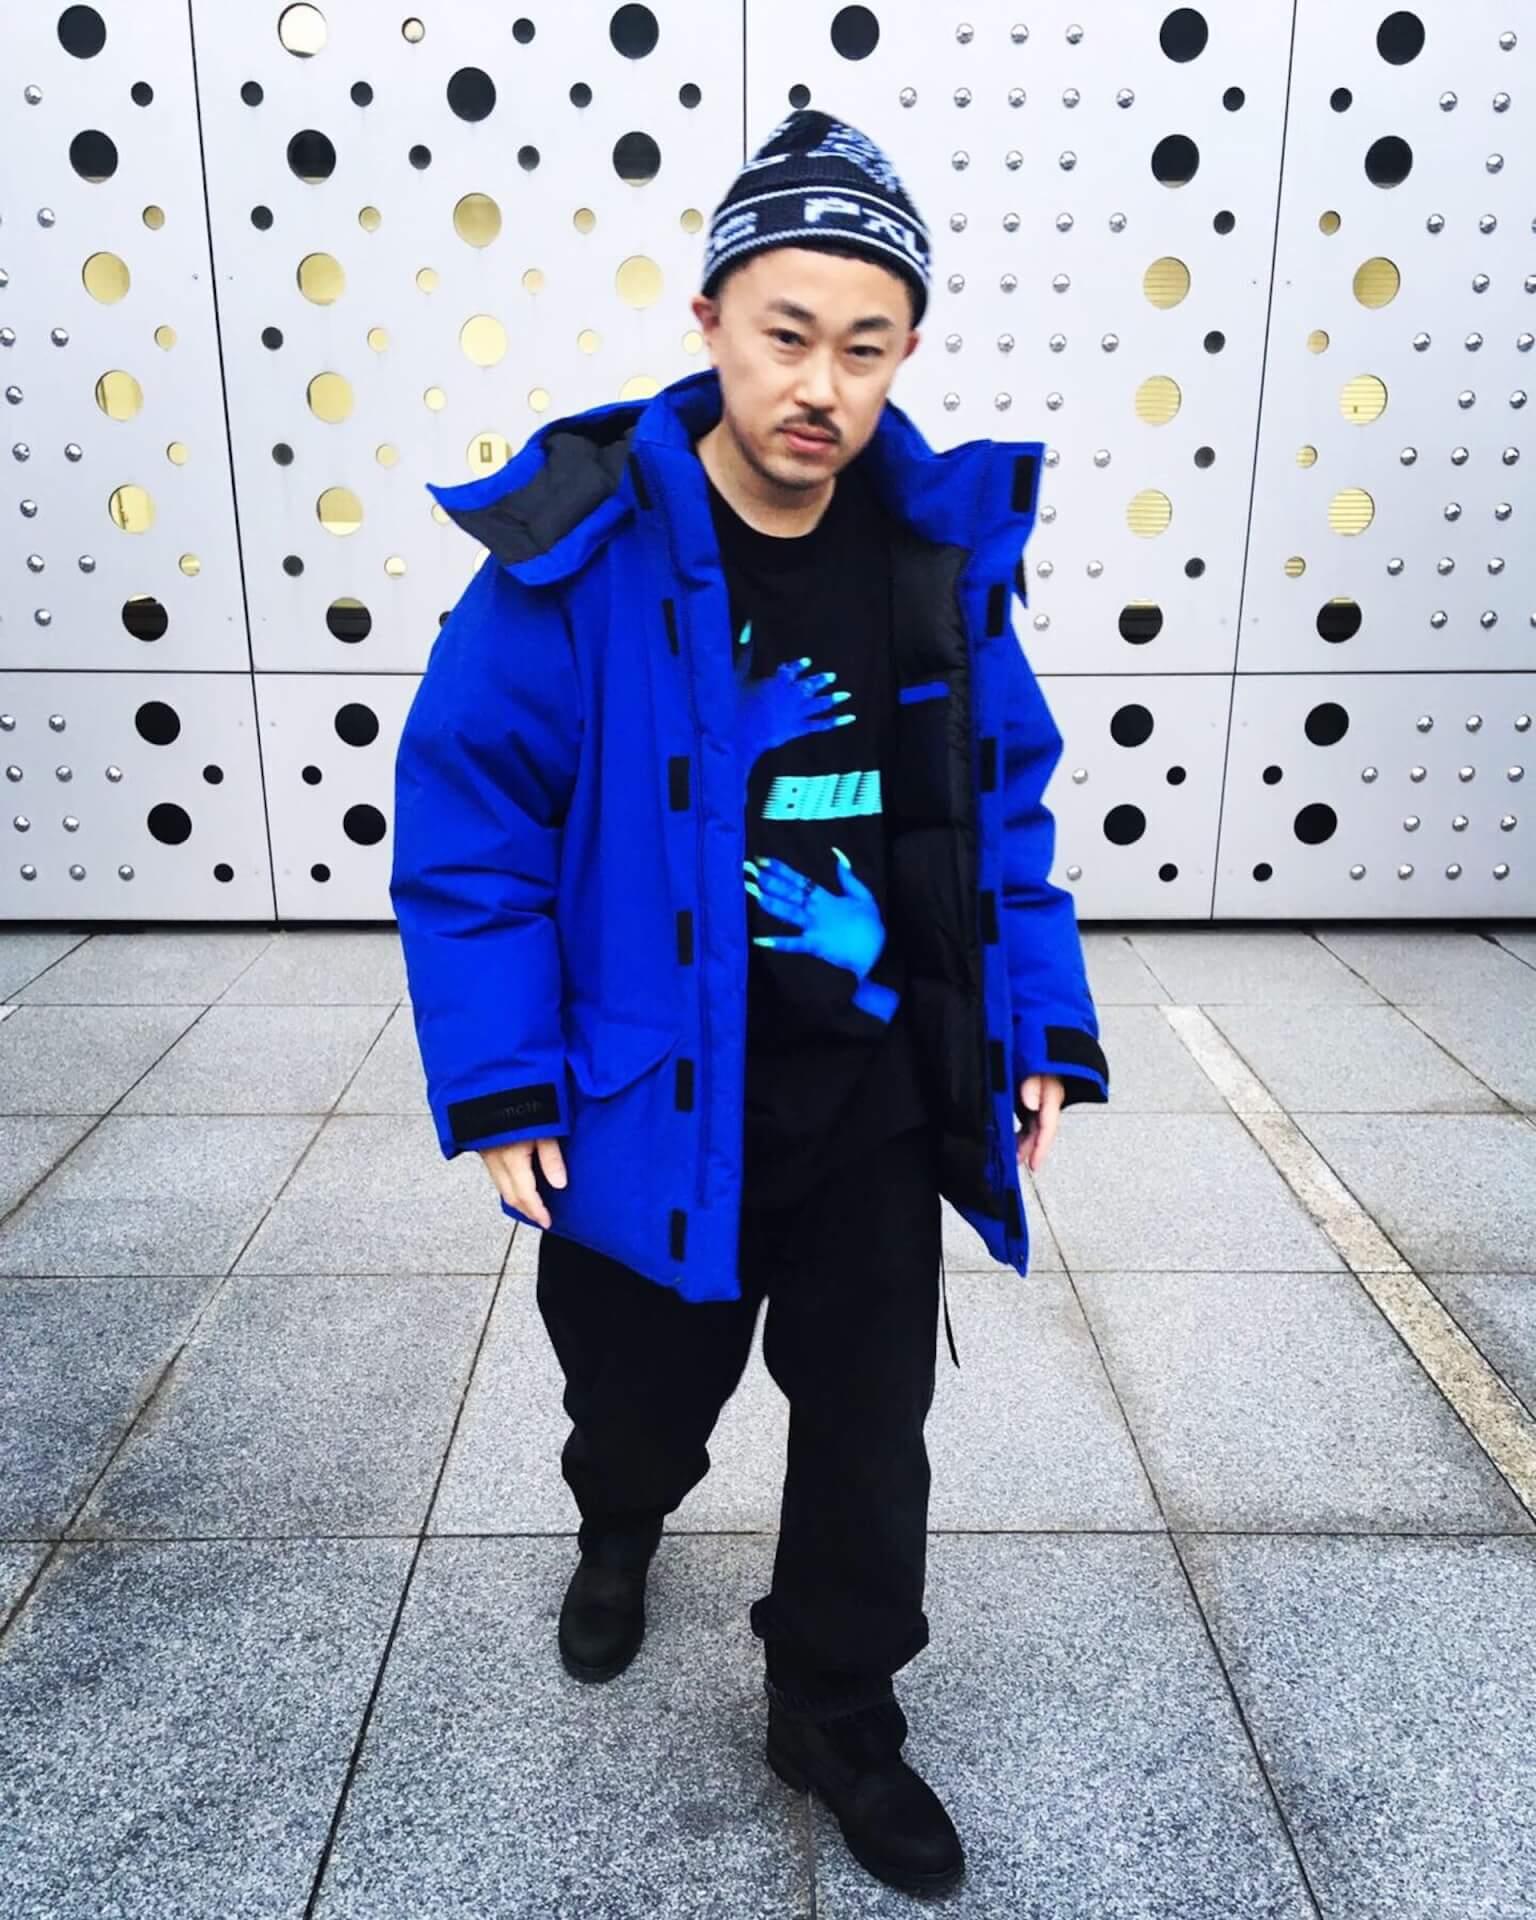 Ultrademon、Yokai Jaki、E.O.U、Kazumichi Komatsu等を迎え現行ユースカルチャーが入り乱れる多様なムードのLocal Worldが開催! music210603_localworld_ether13